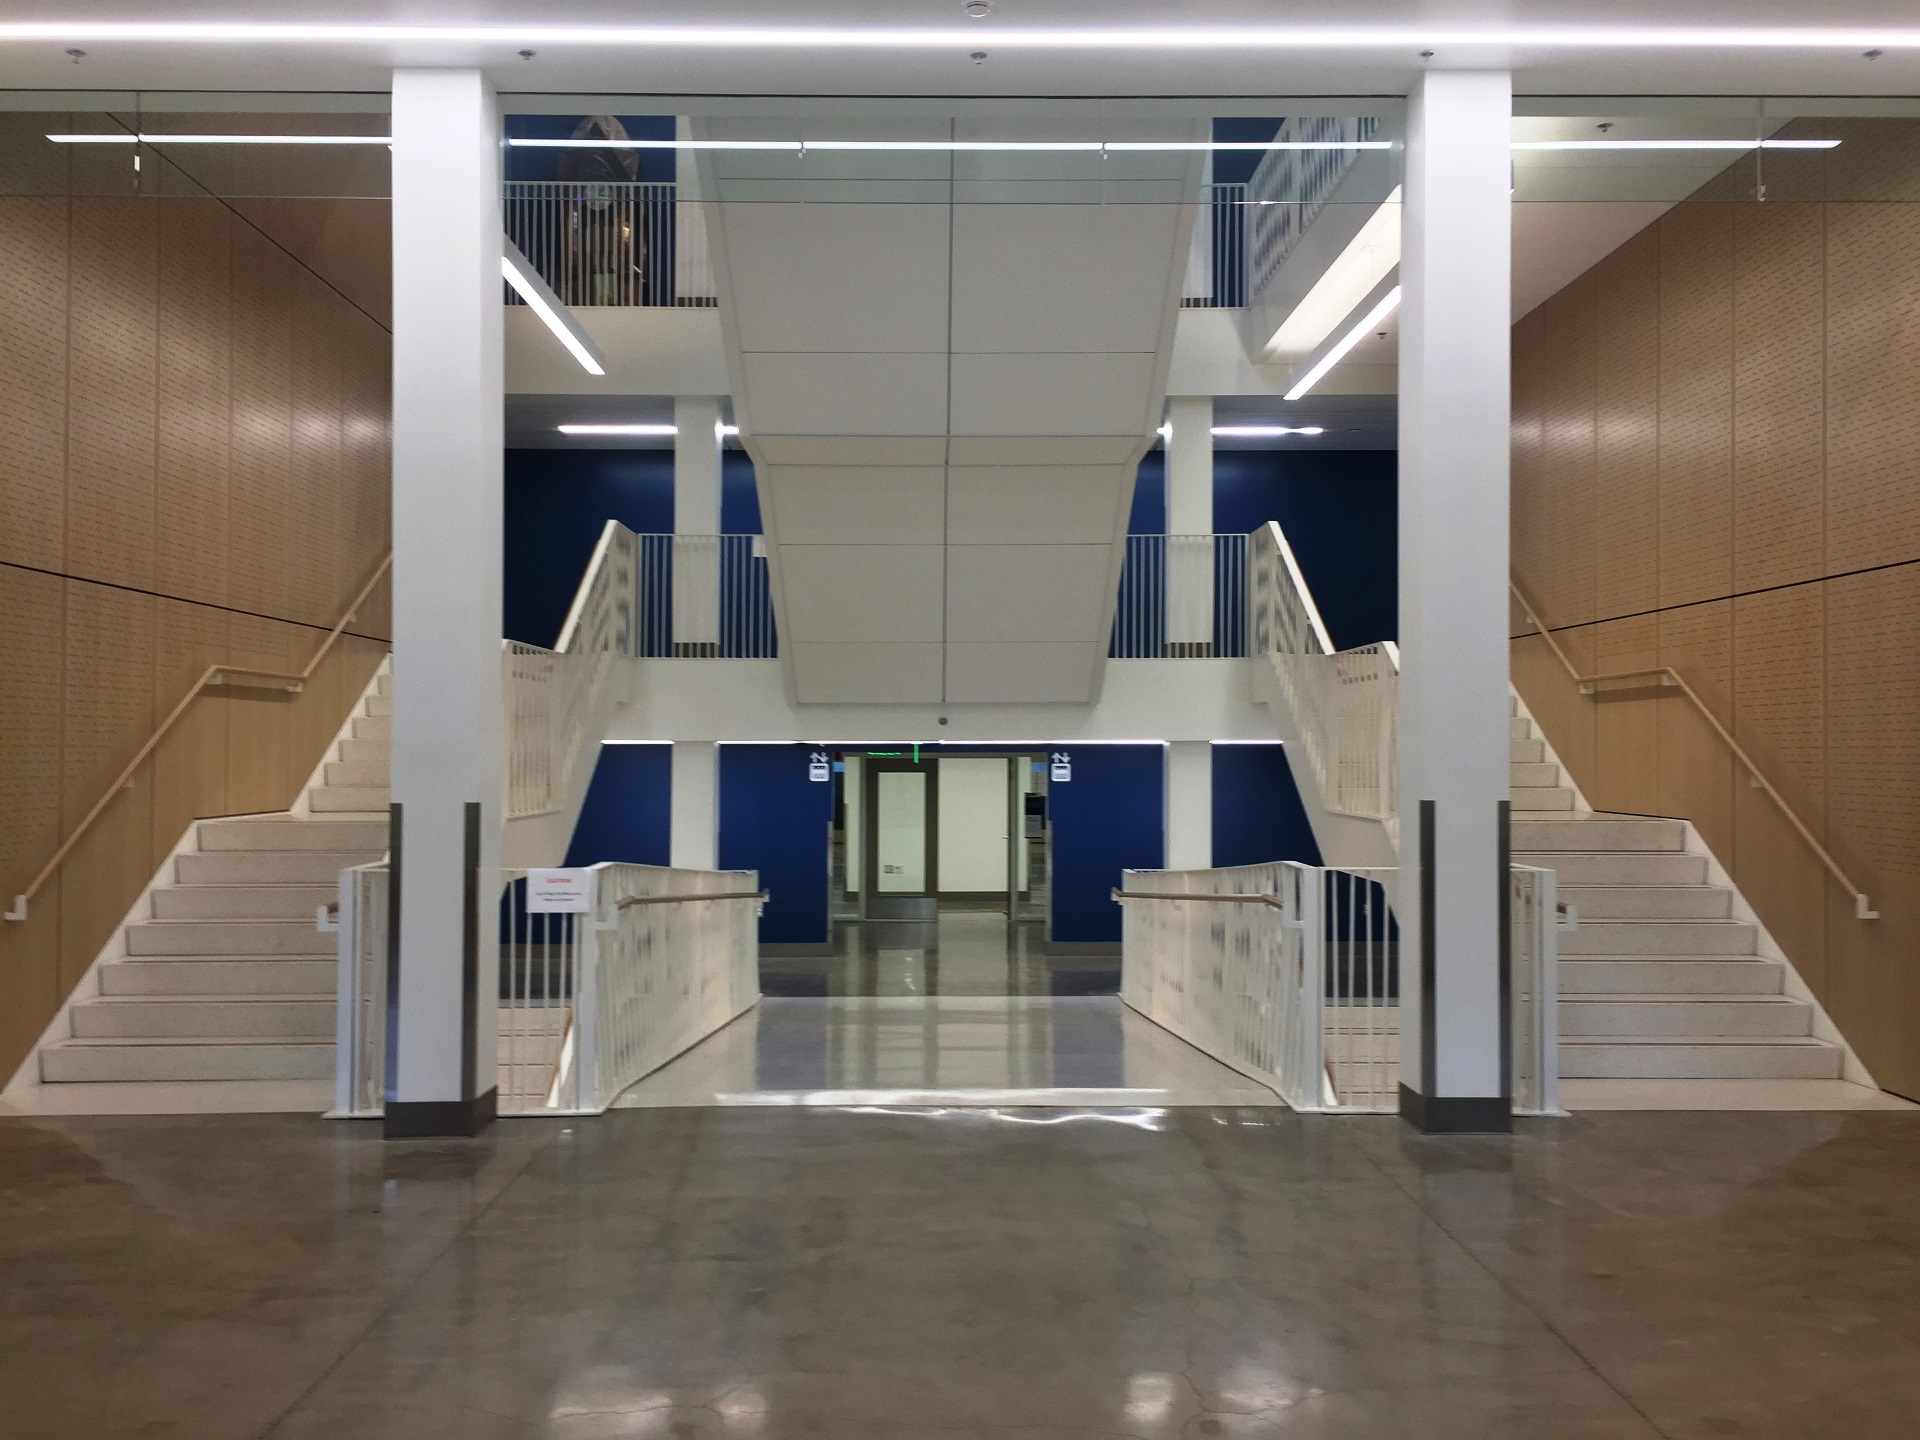 University of Washington: Denny Hall Photo